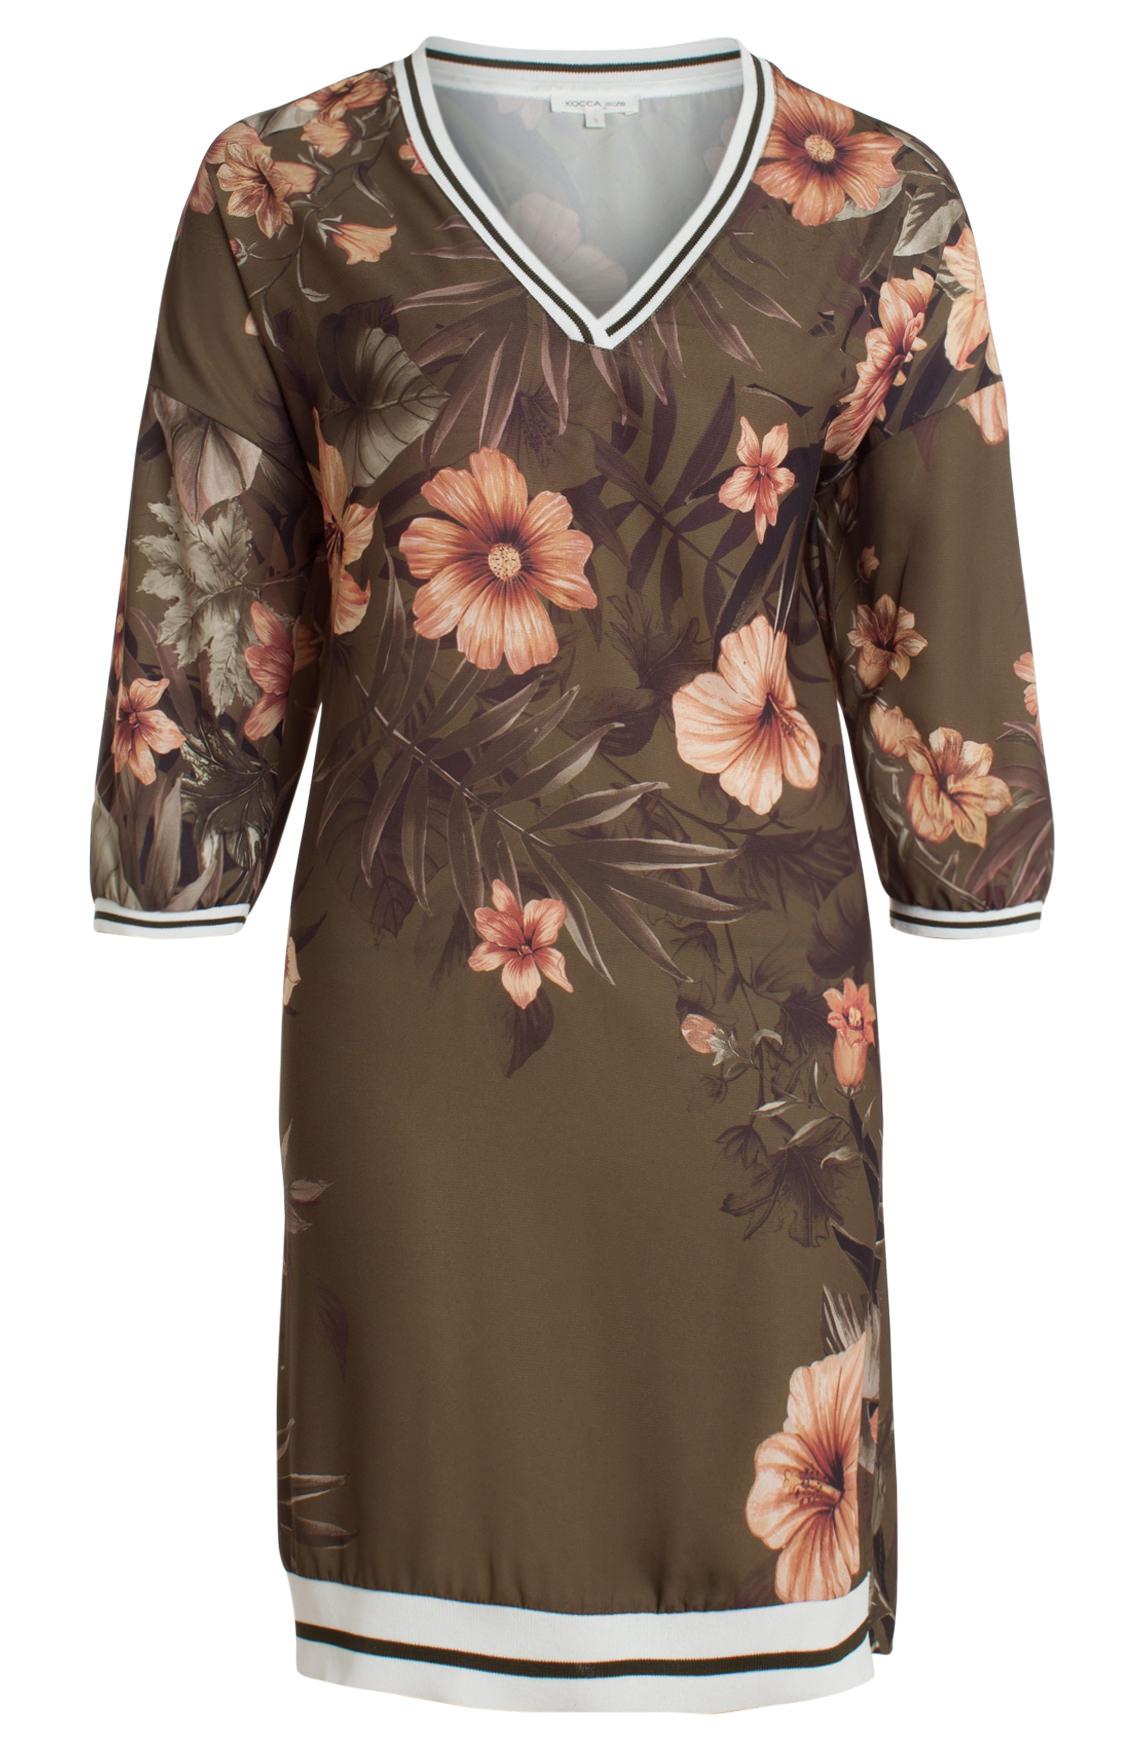 Kocca Dames Inroit jurk met bloemenprint groen